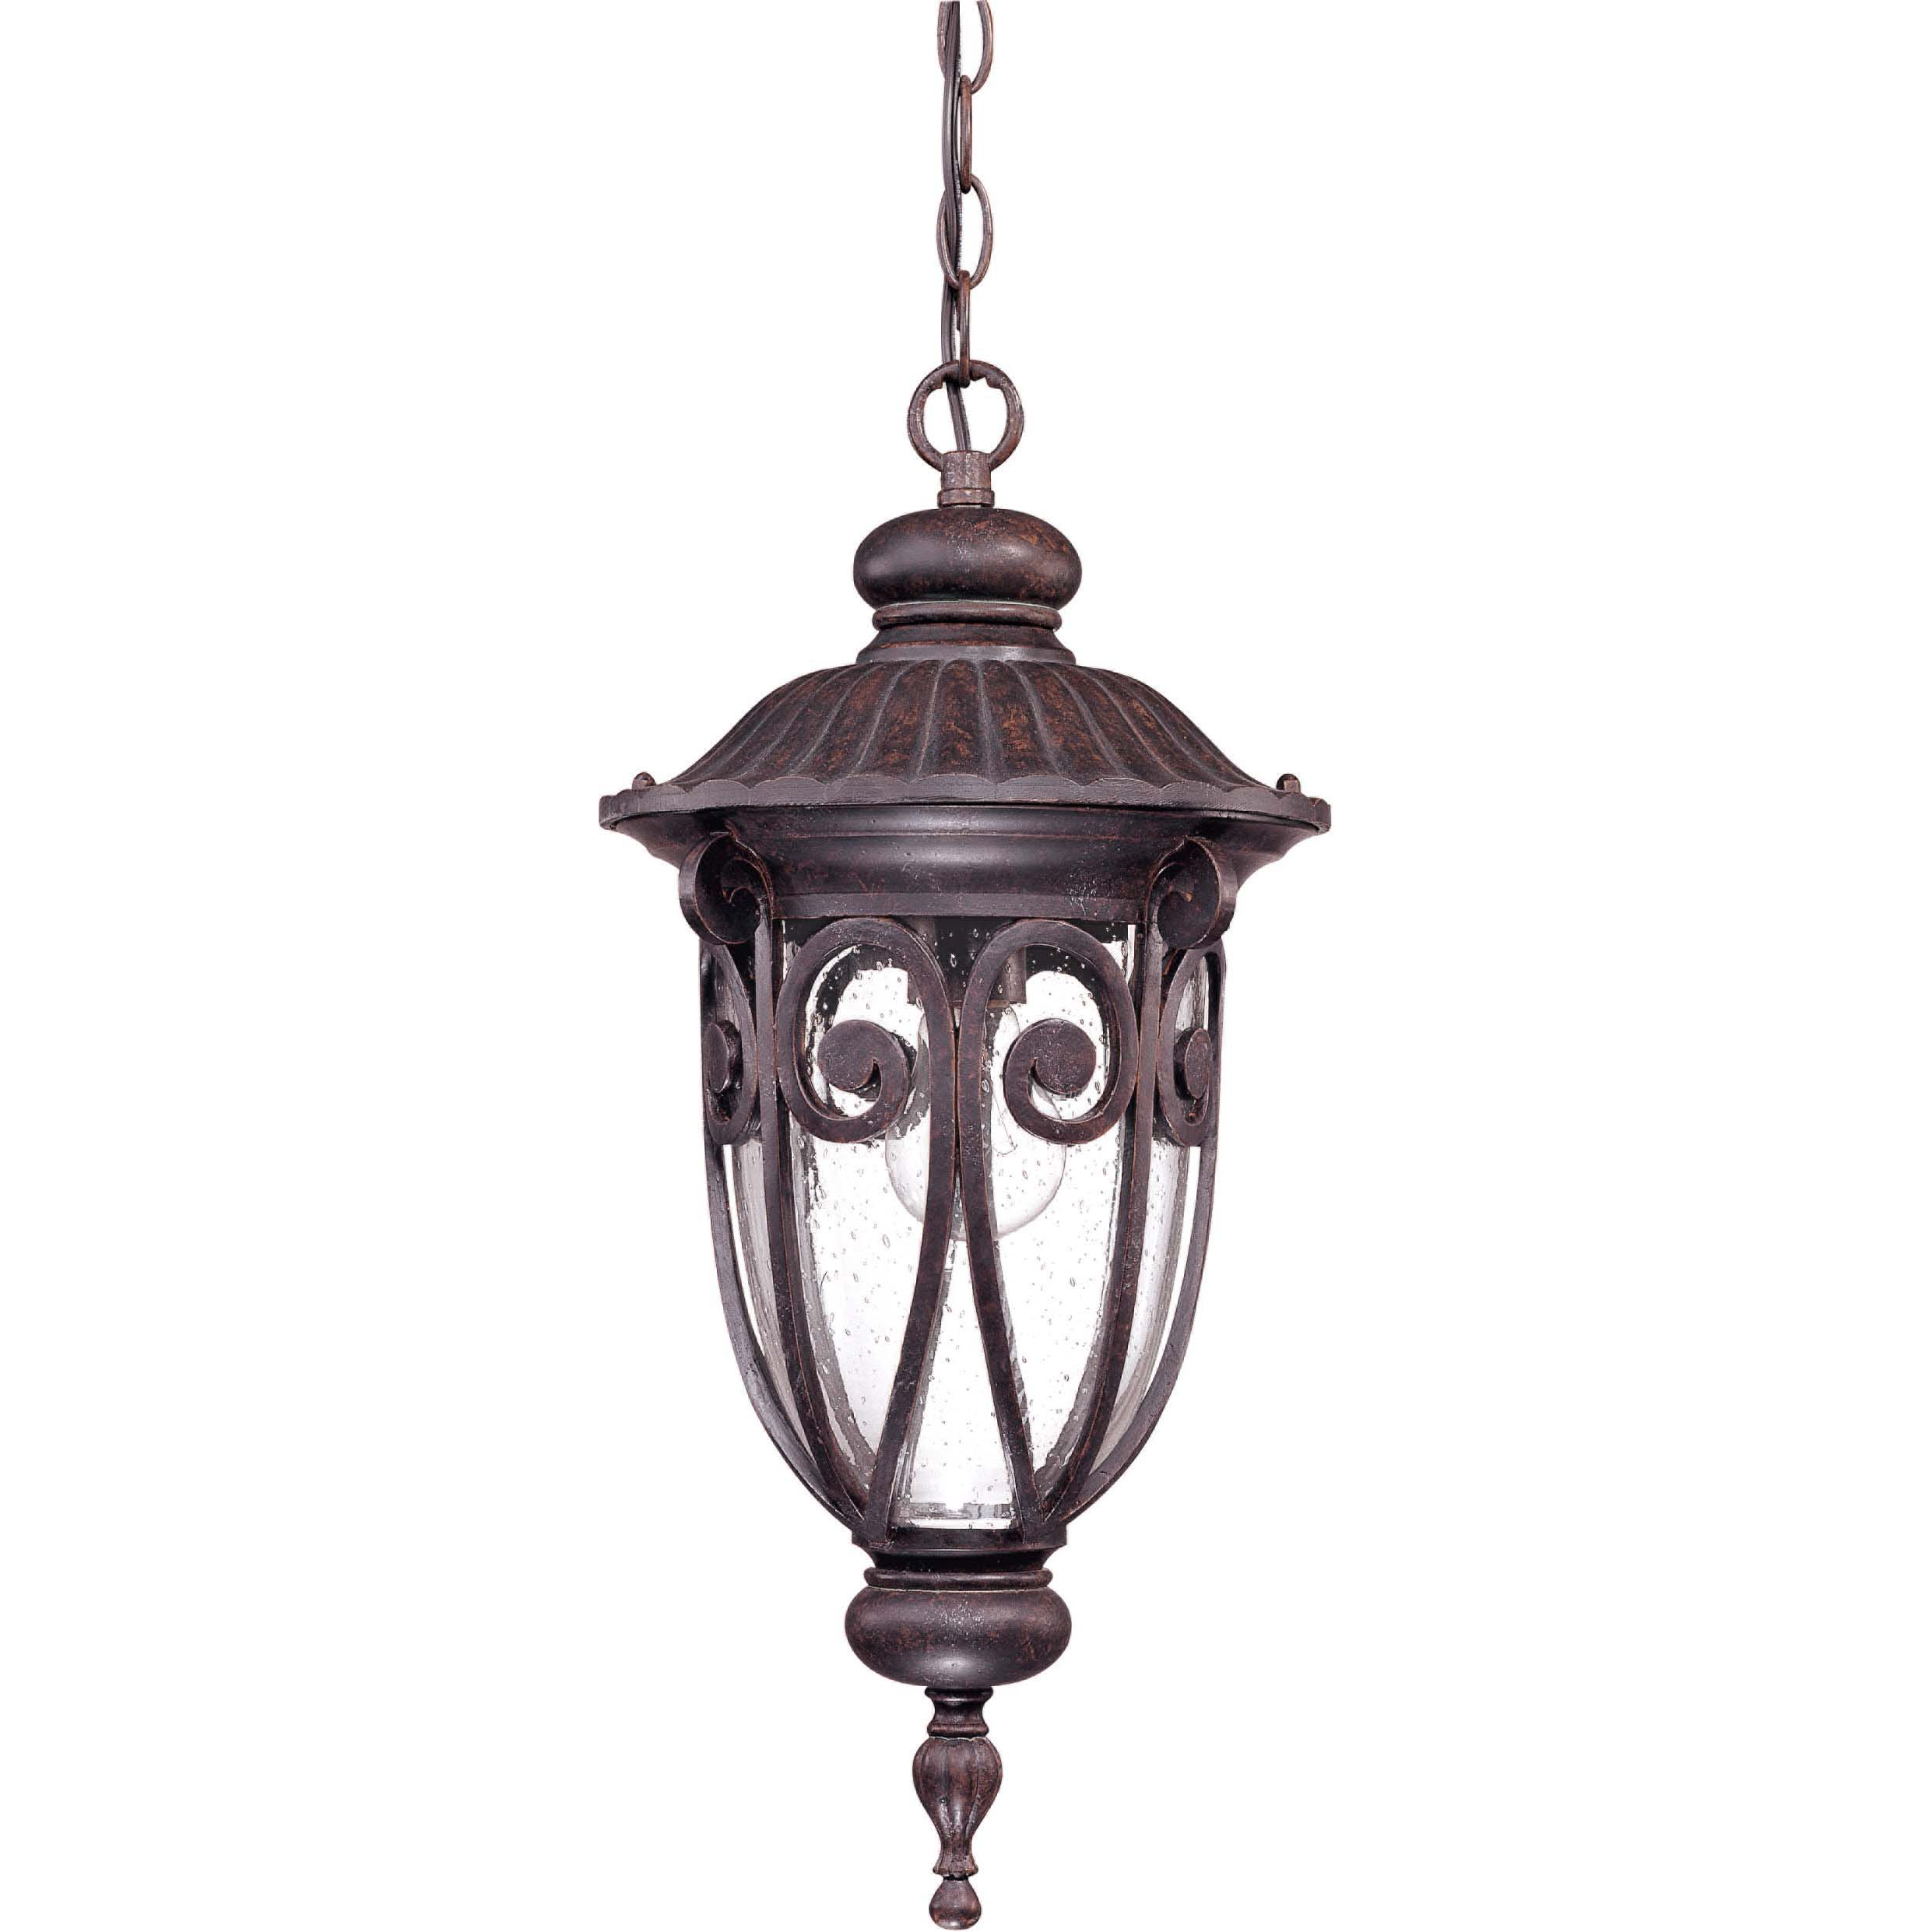 Corniche 1-light Burlwood Hanging Lantern